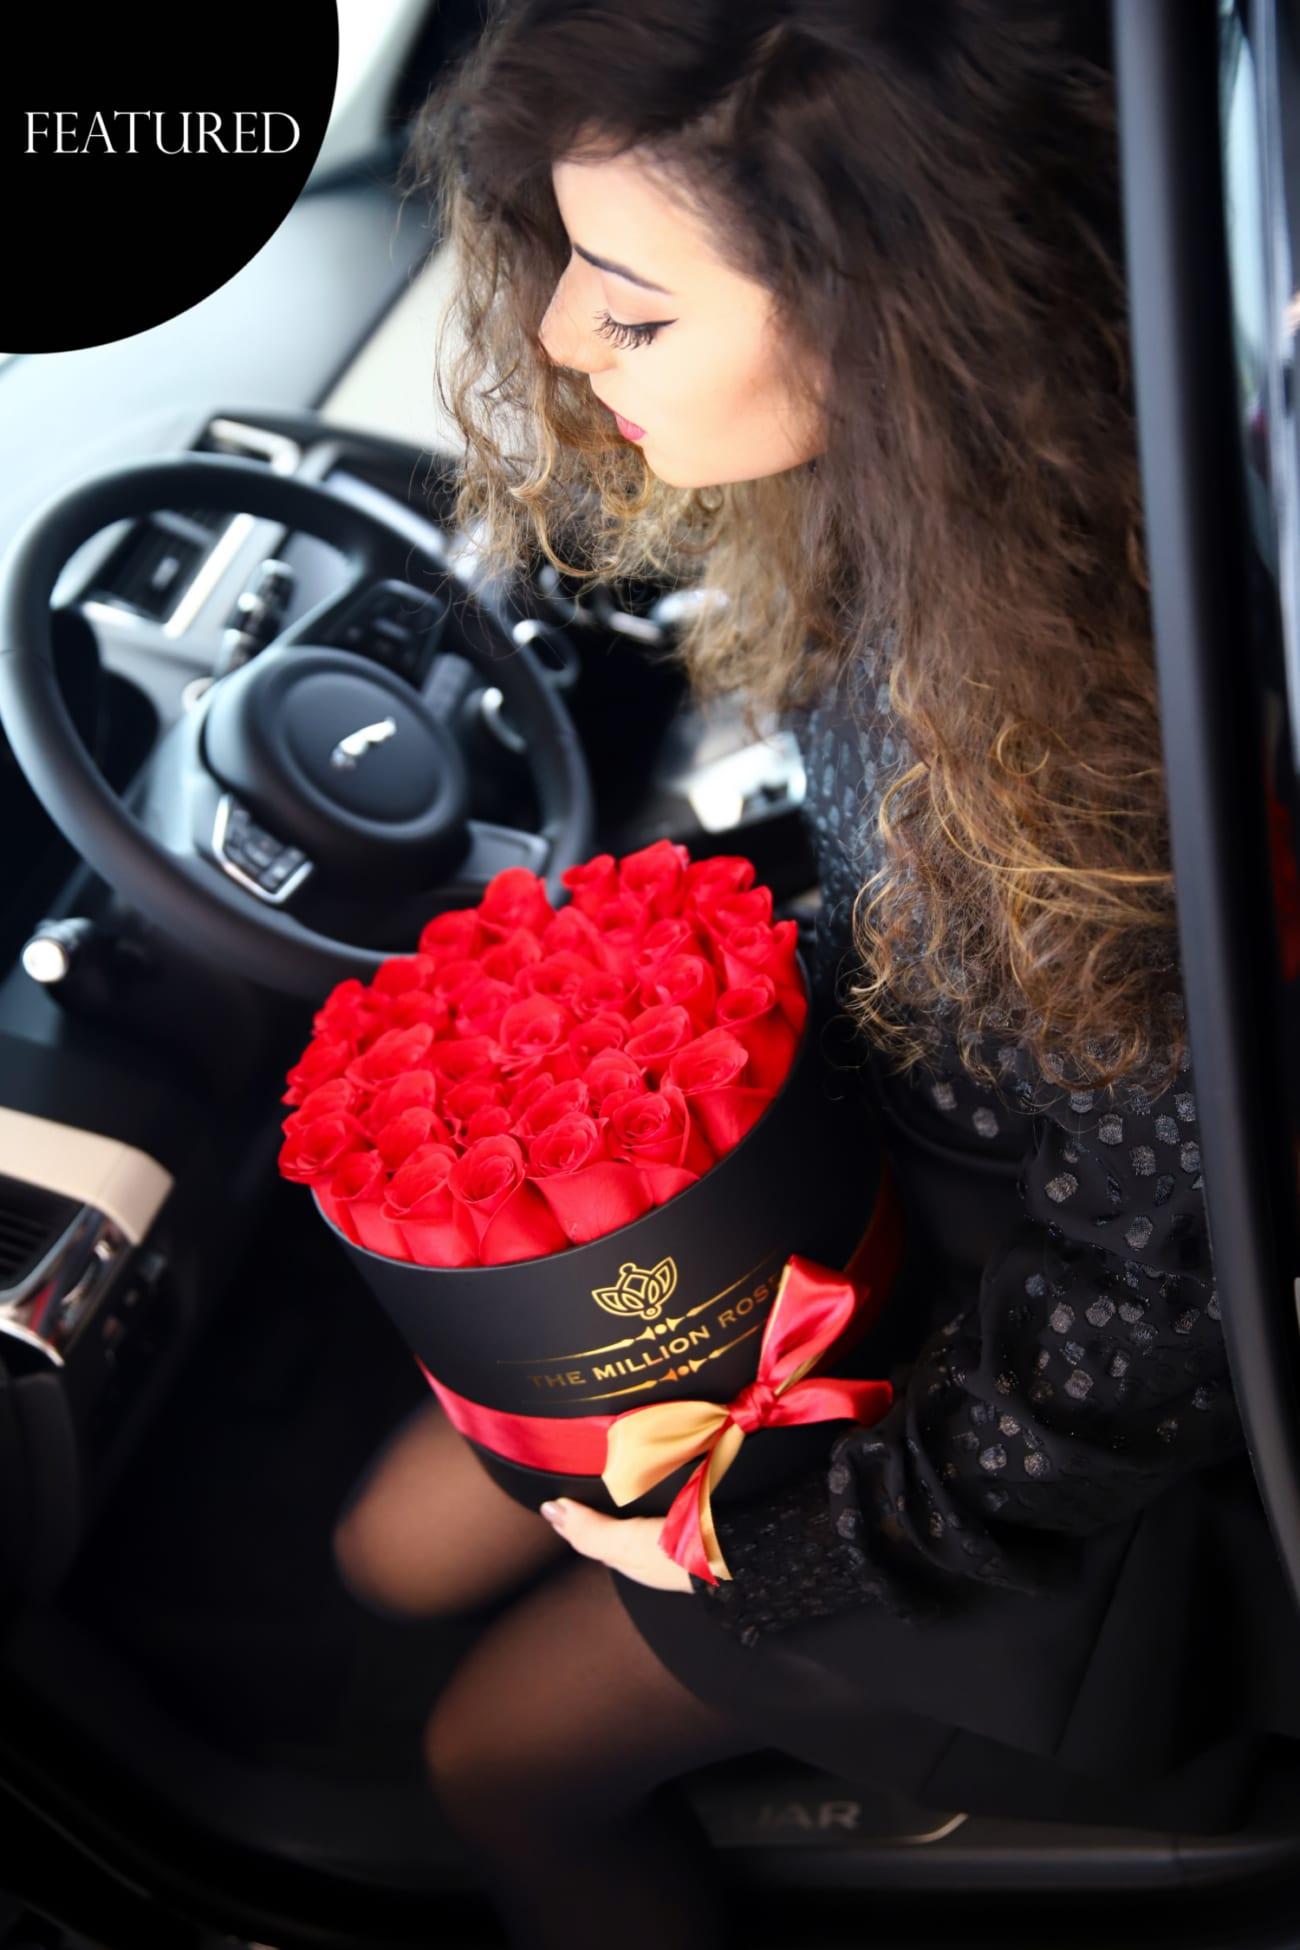 The Million Roses Timisoara